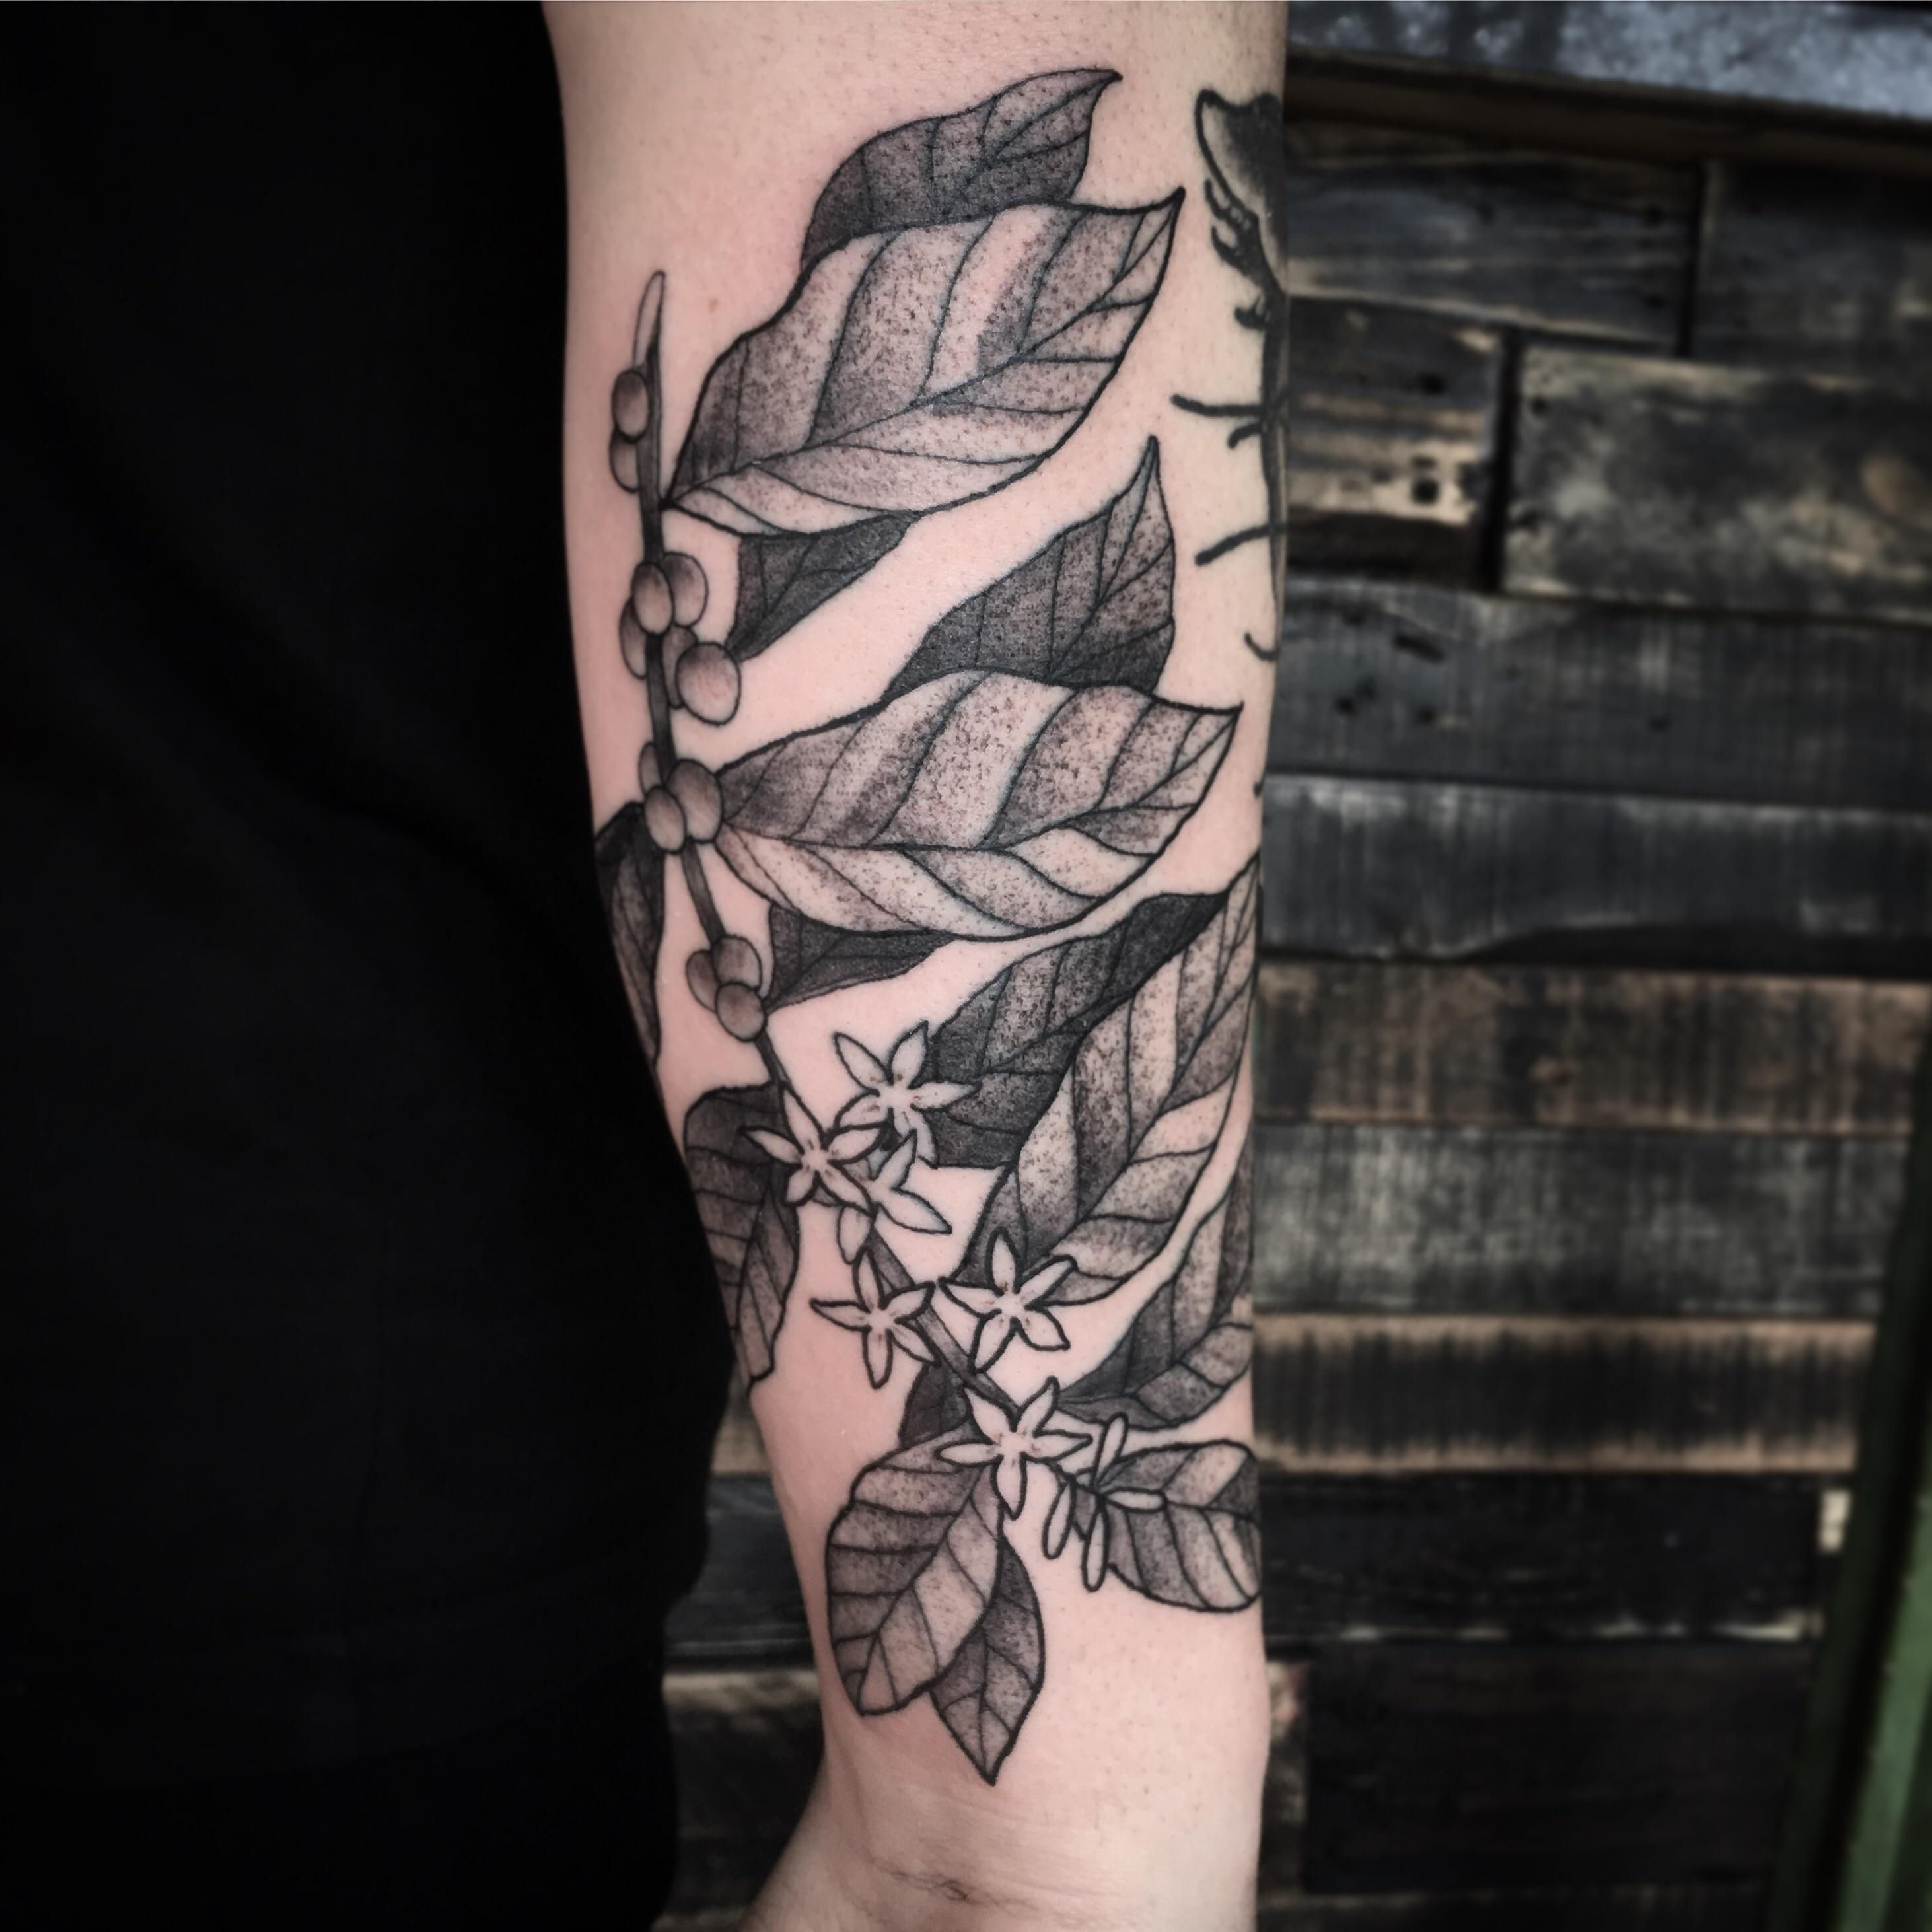 Coffee Plant James Venice Sacred Serpent Tattoo Melbourne Serpent Tattoo Coffee Plant Melbourne Tattoo